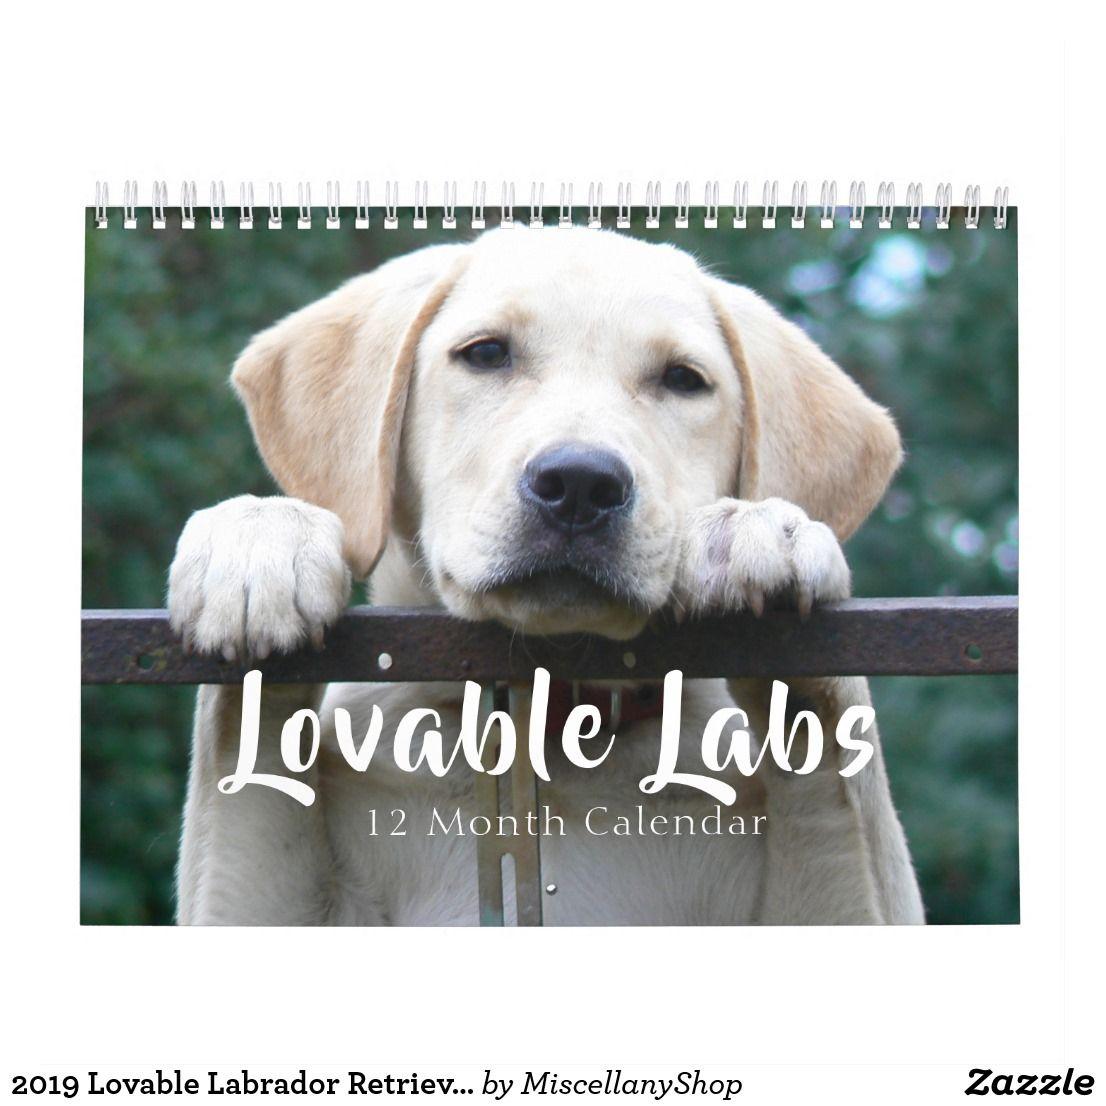 2020 Loveable Labrador Retriever Dog Calendar Zazzle Co Uk